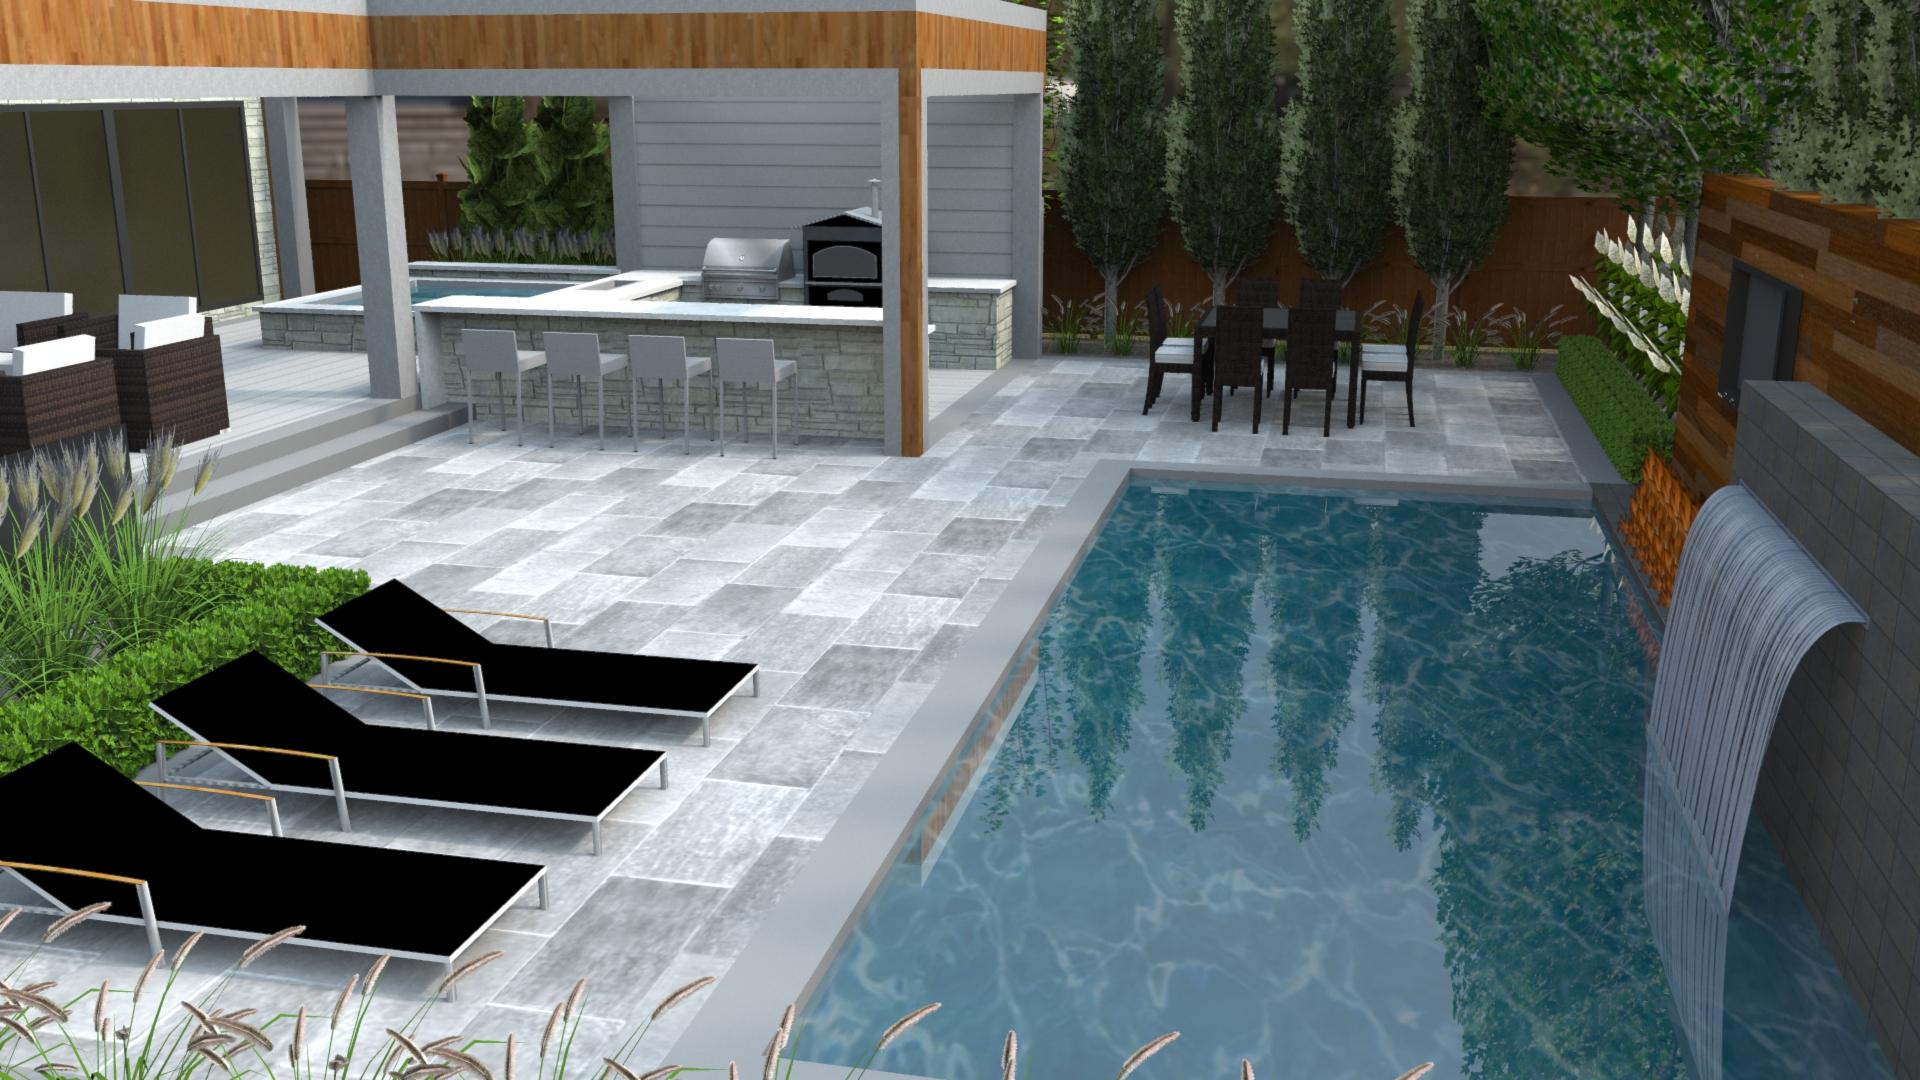 Lakeshore meg kennedy landscape design firm for Landscape design firms